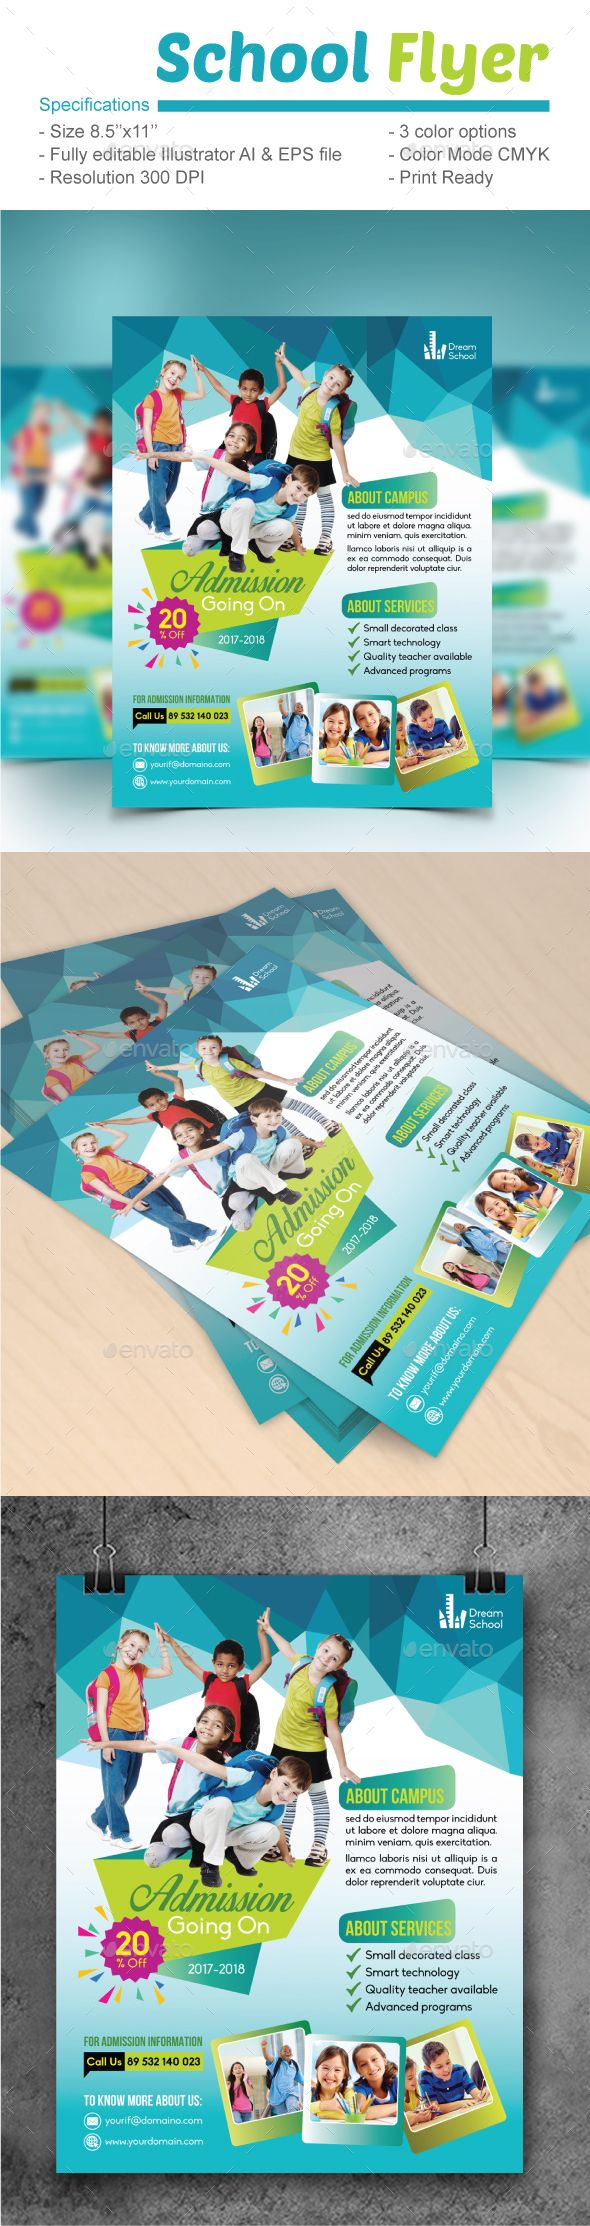 childcare nursery flyer design templates design and flyer template school flyer design template flyers design print template vector eps ai illustrator